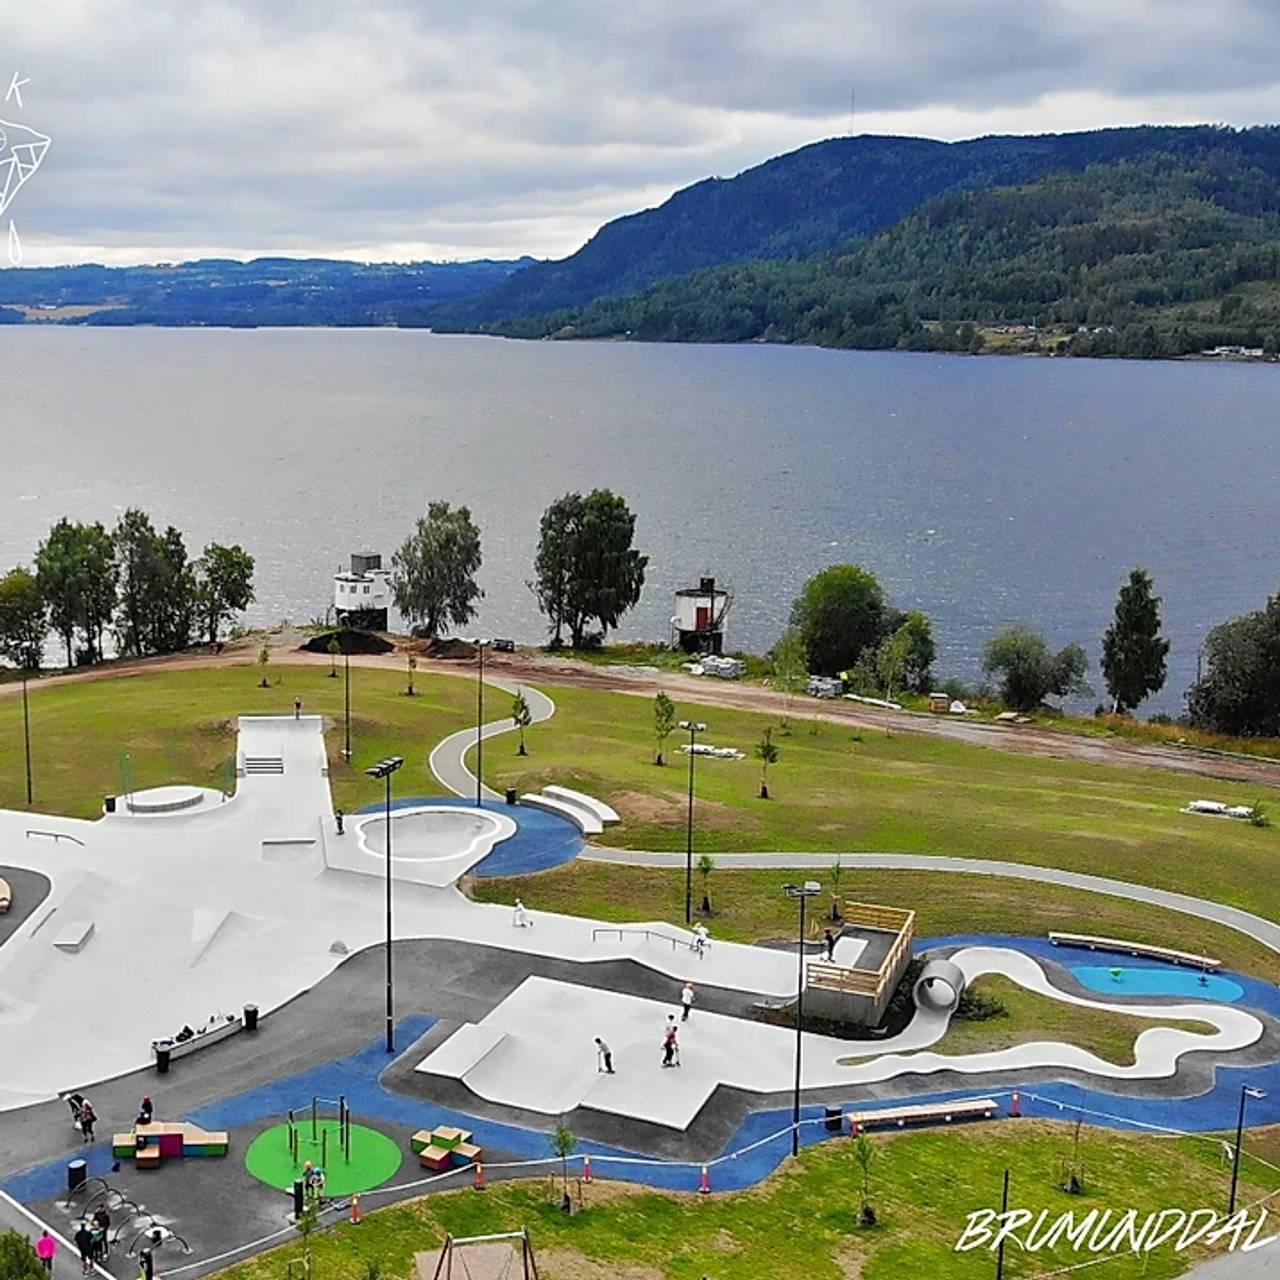 Skatepark Brumunddal